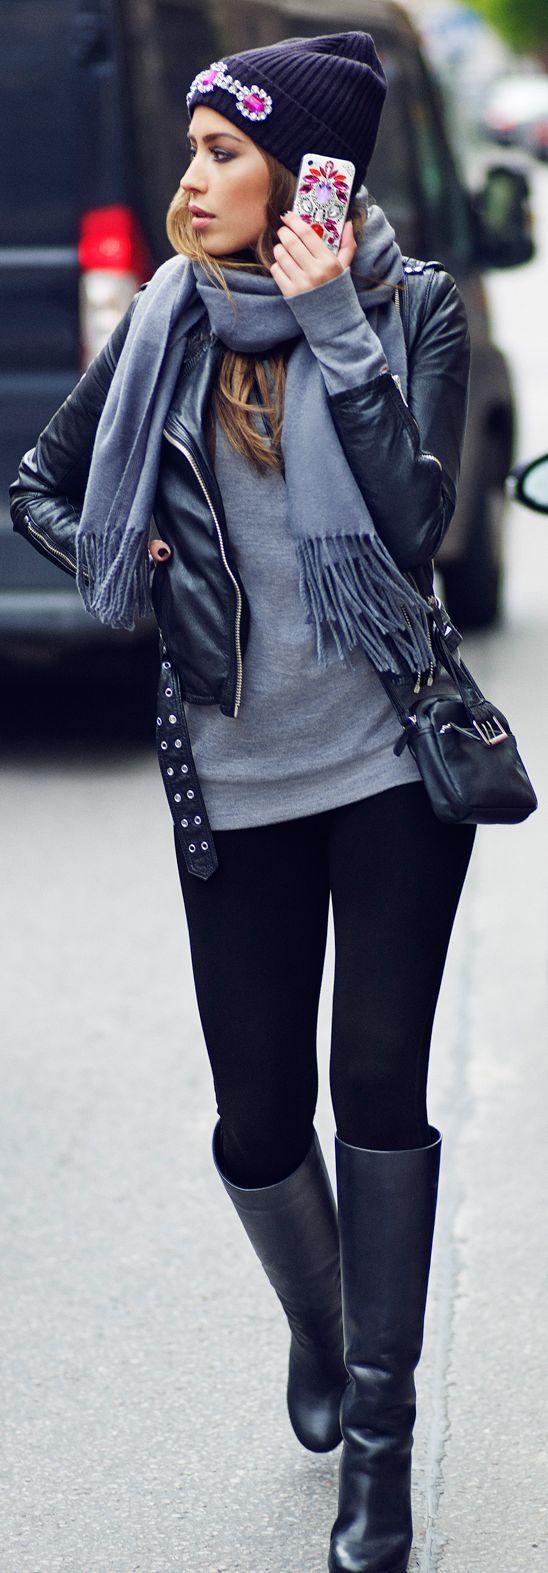 Daily New Fashion : Best Womens Street Fashion for Fall/Winter VISIT http://azonworld.com